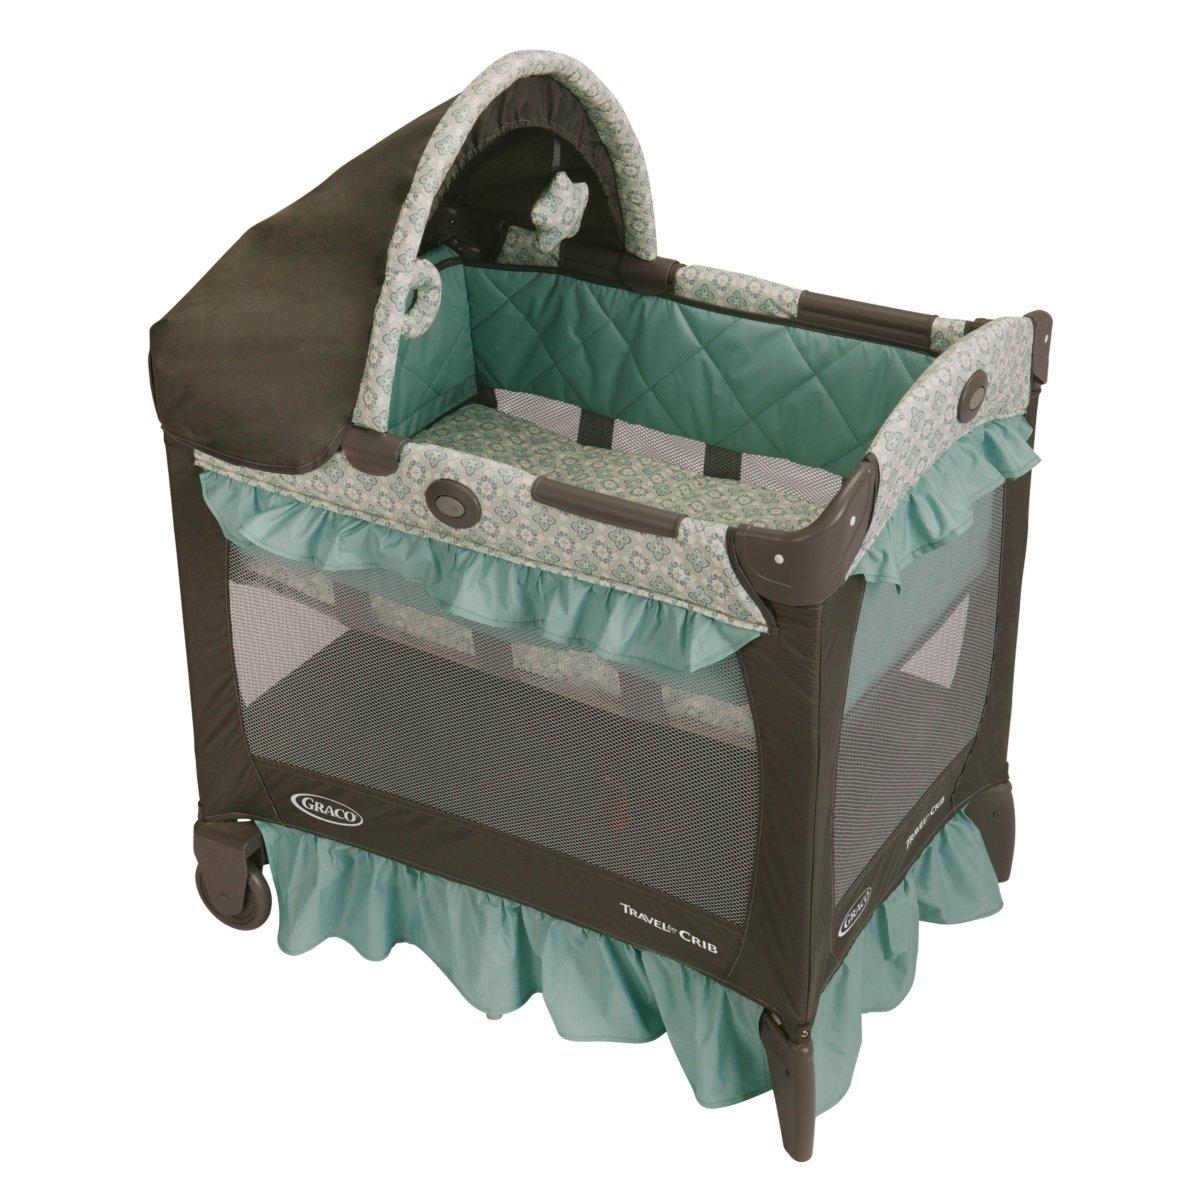 71bNXncnRDL. SL1200 Top 10 Best Baby Cribs 2021 - Rocking, Swinging, Nursery Cribs Reviews